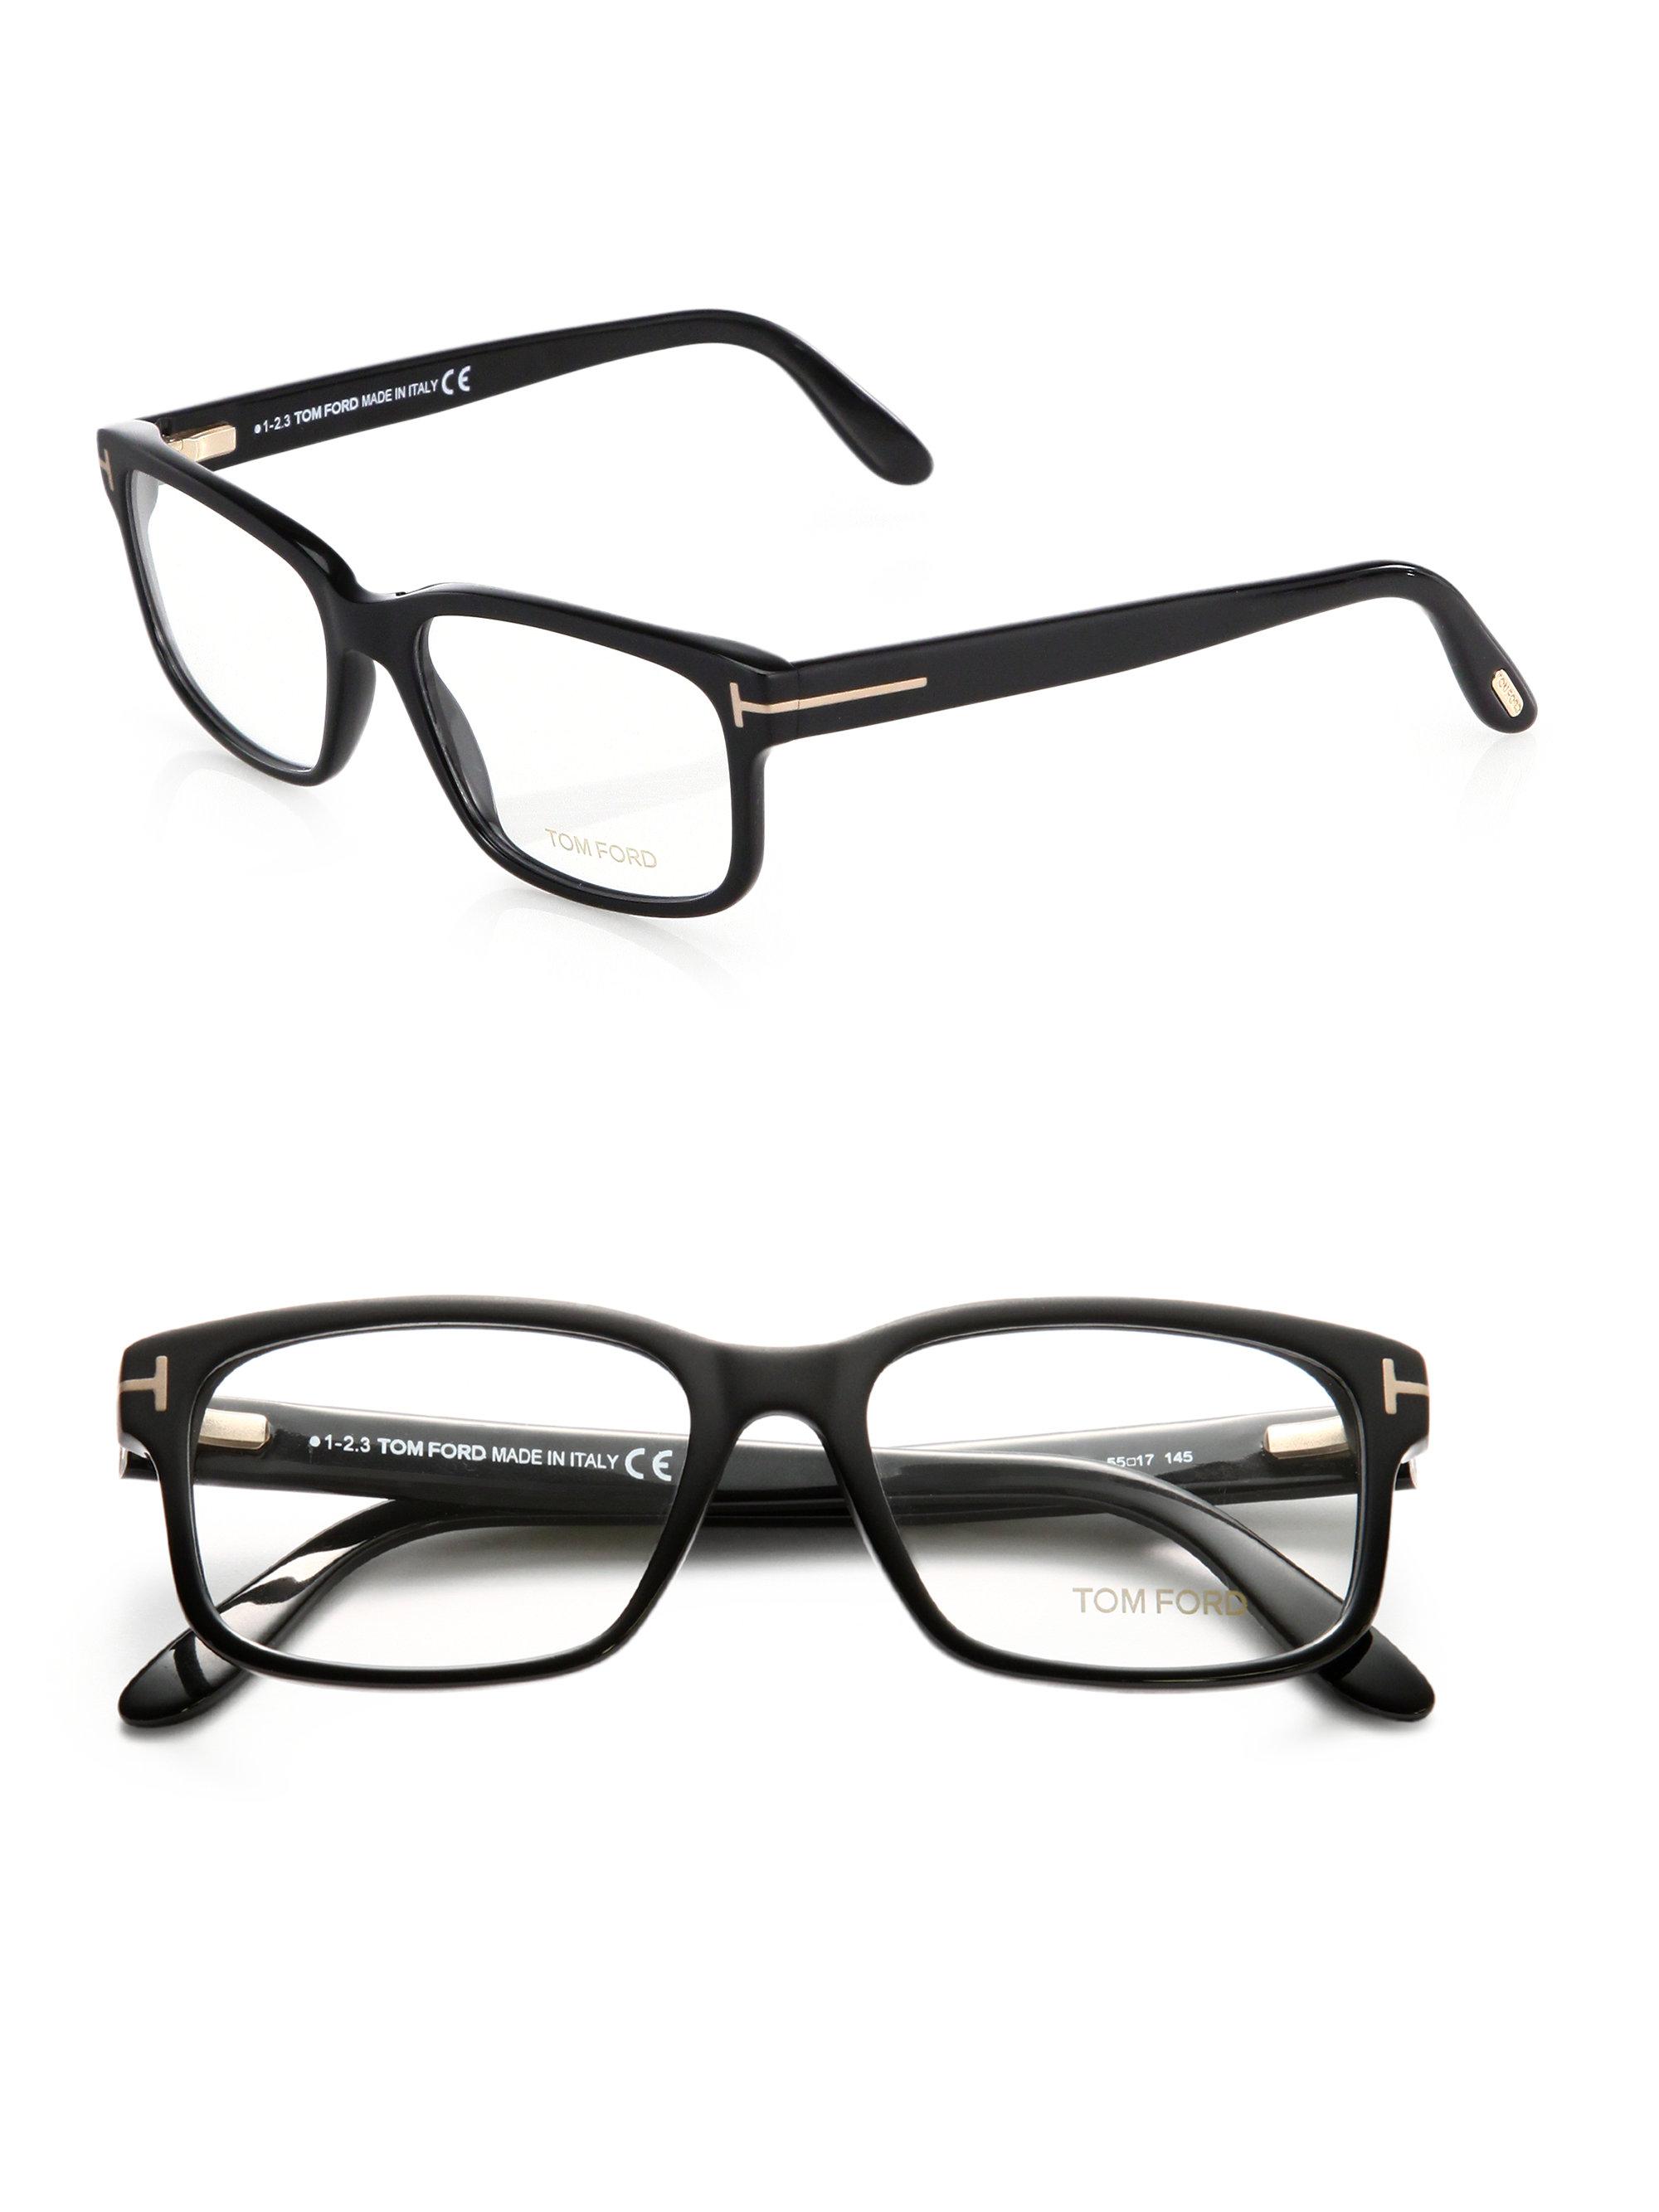 tom ford optical glasses 2014